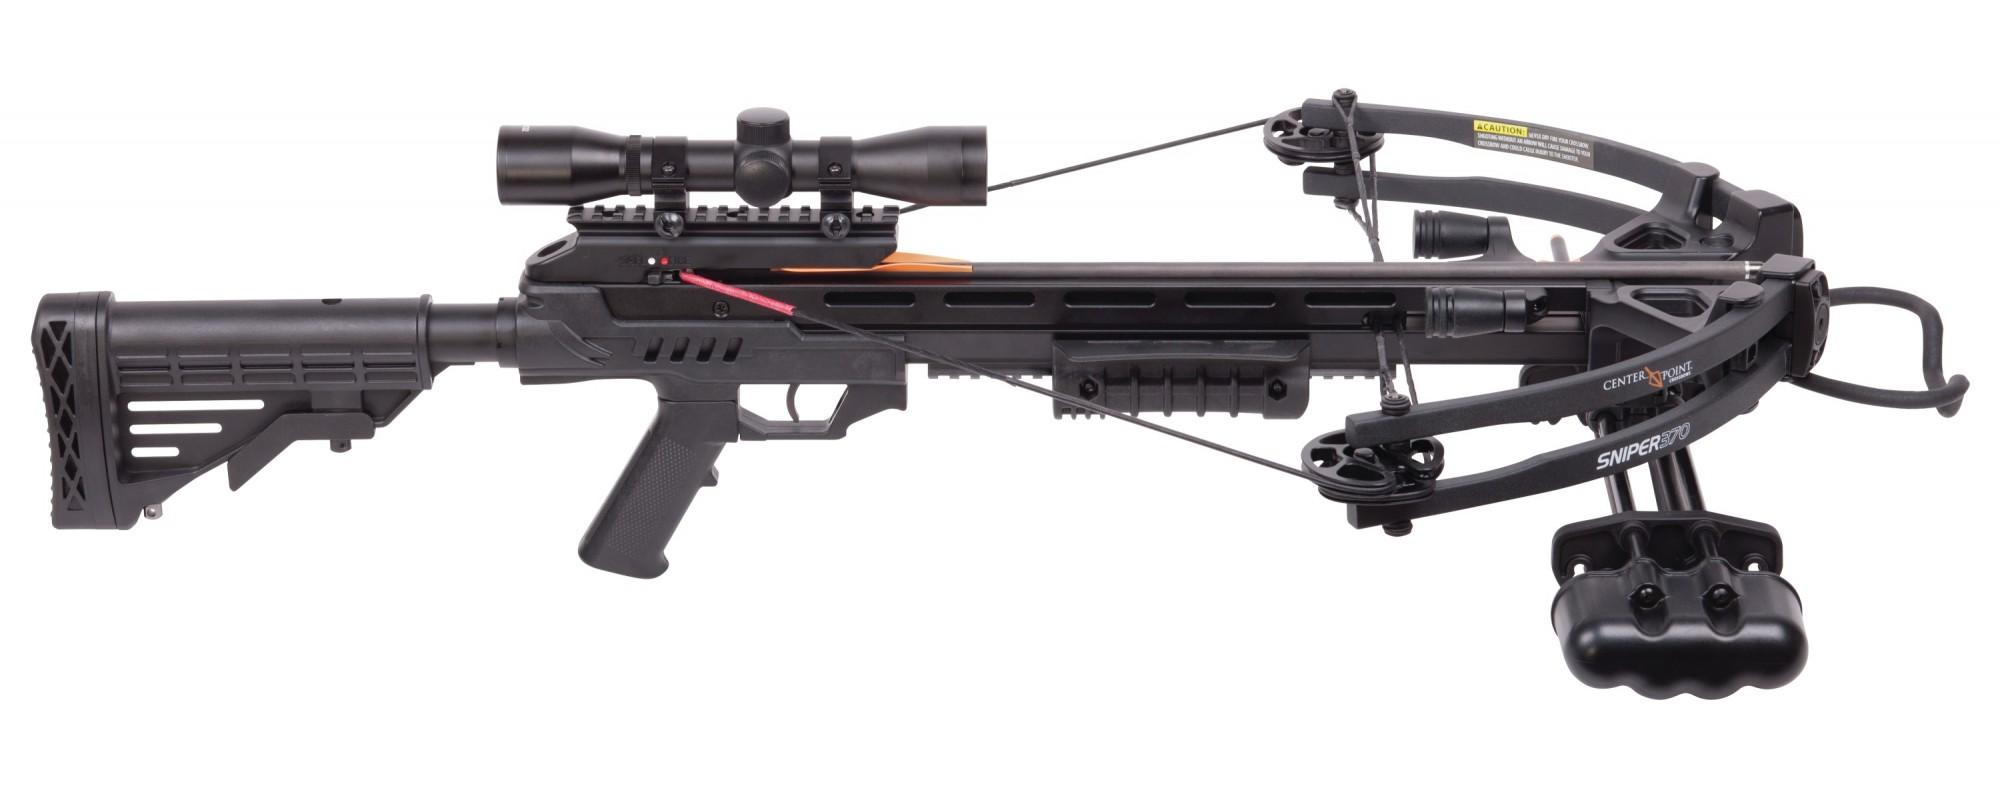 opplanet-centerpoint-sniper-370-compound